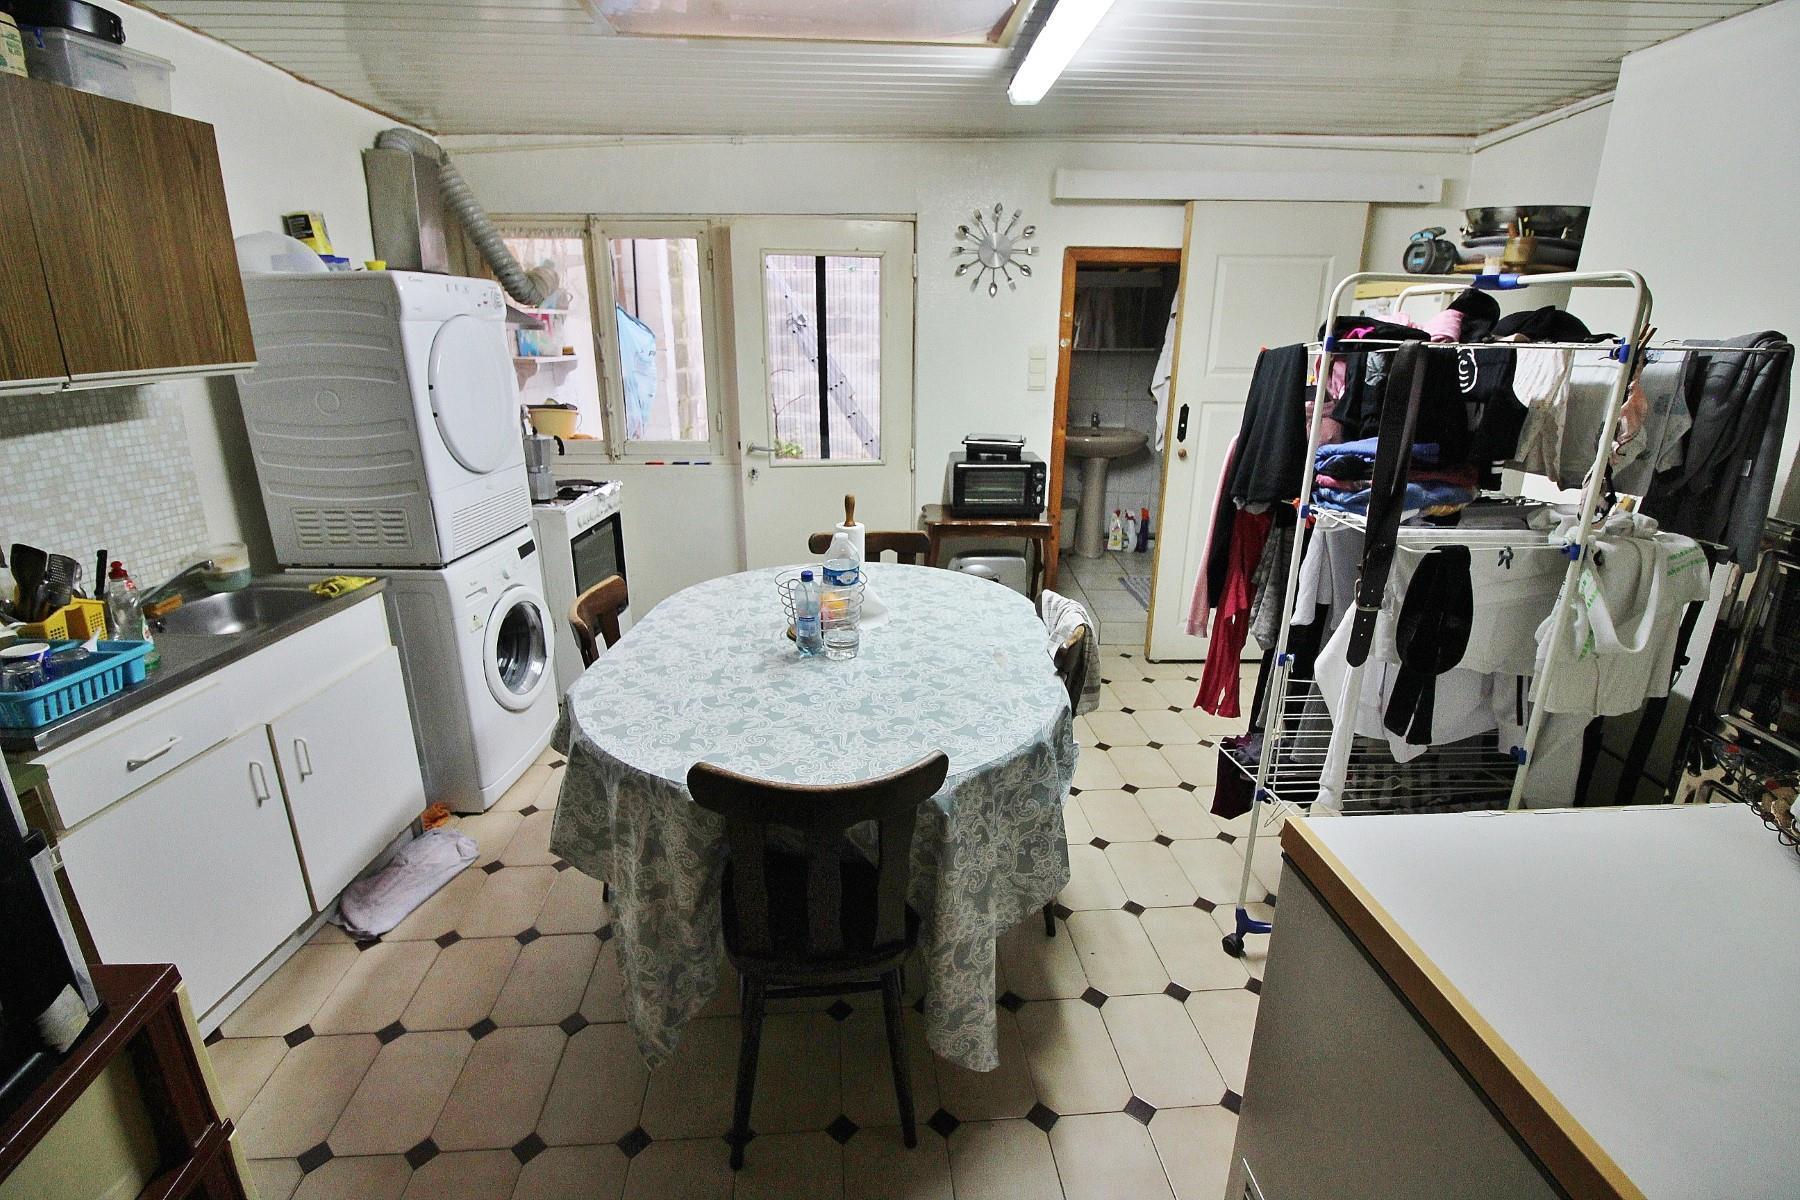 Maison - Seraing Jemeppesur-Meuse - #3879549-5